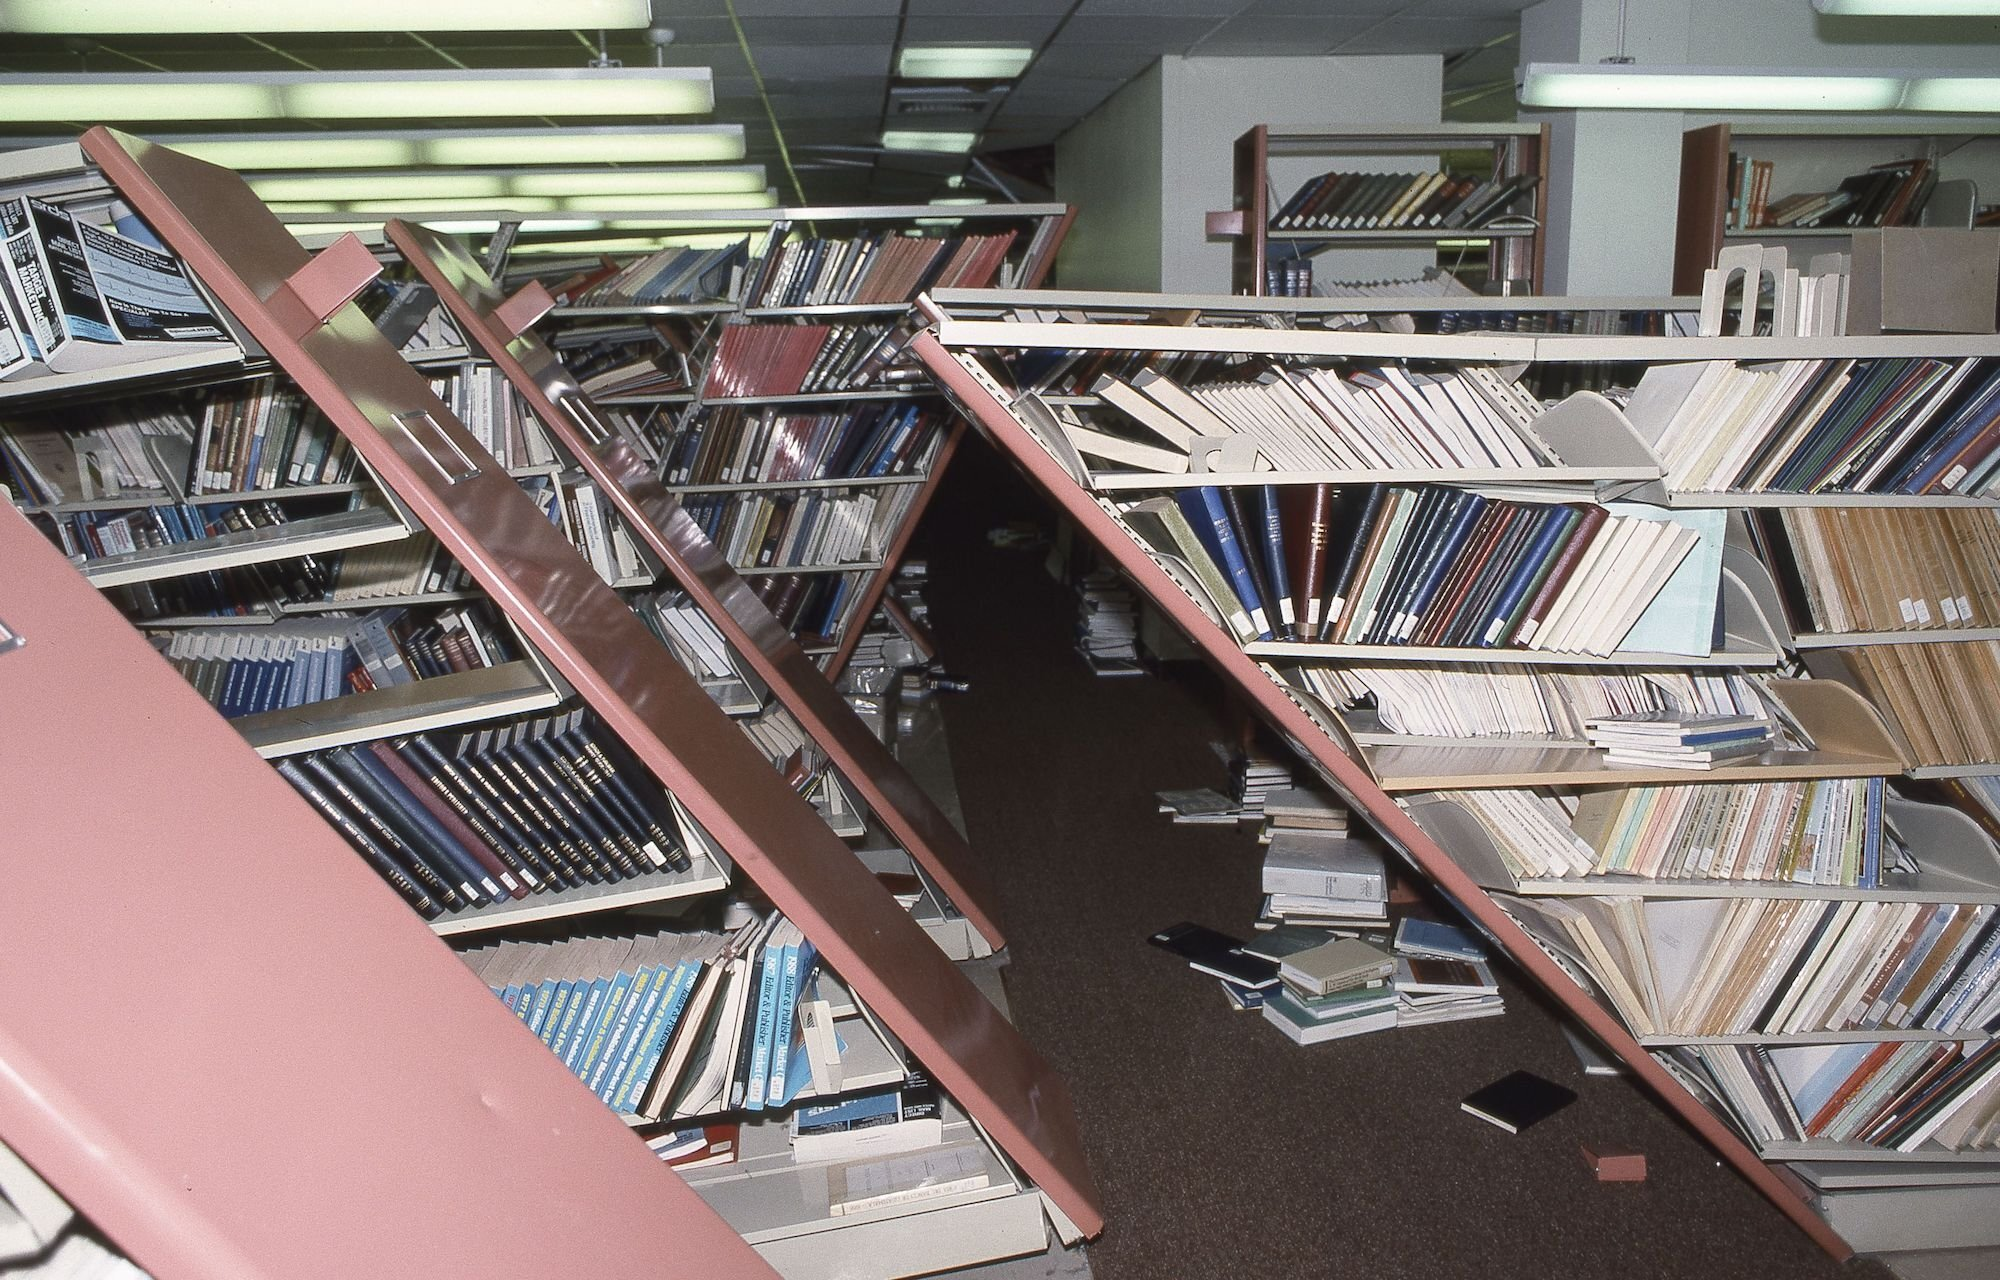 Ніжна матерія бібліотек